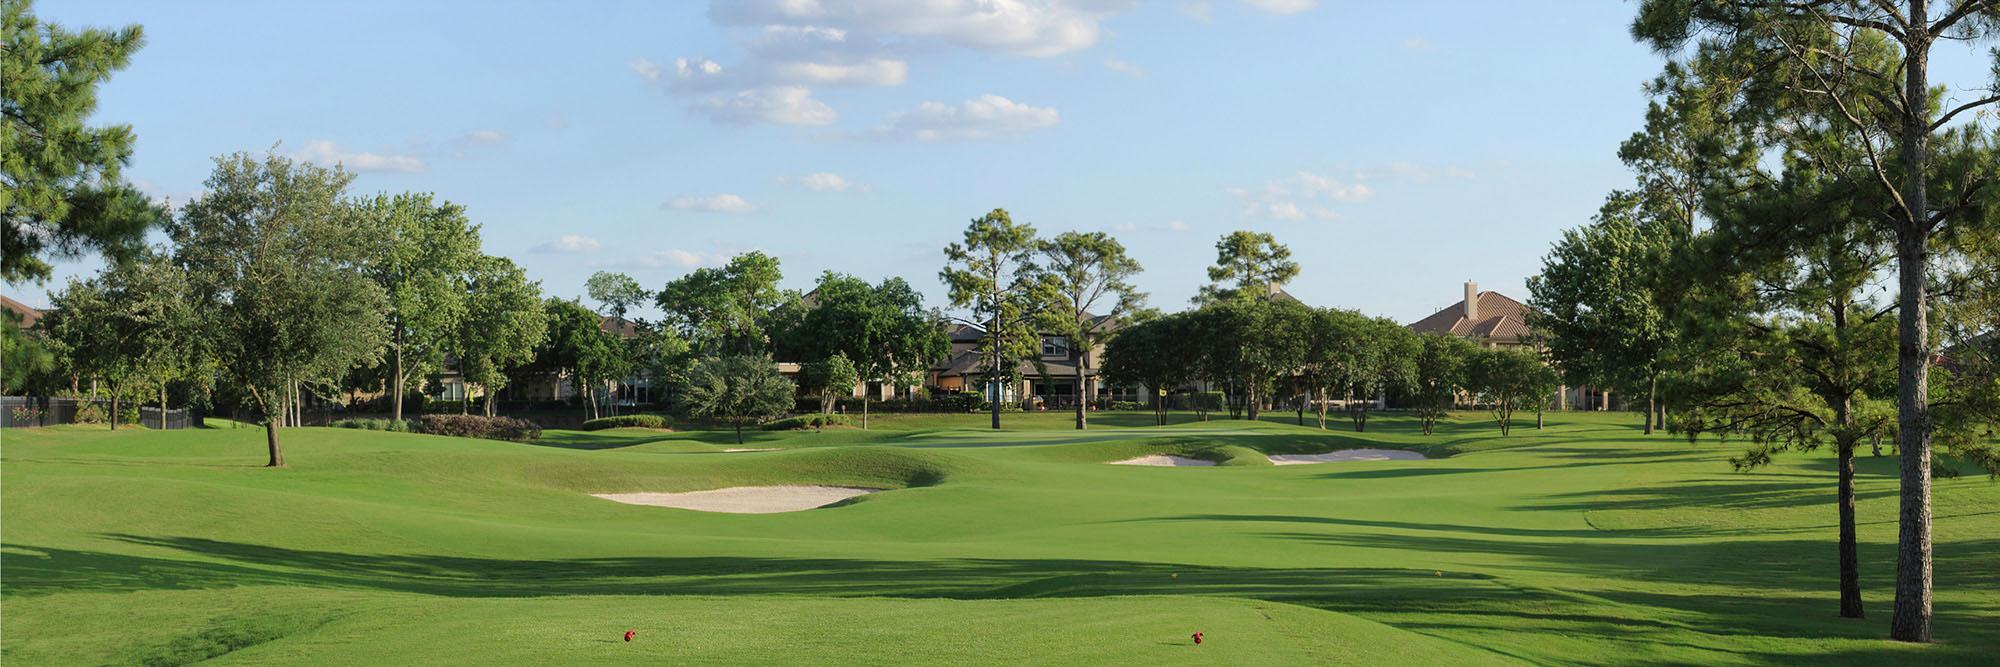 Golf Course Image - Royal Oaks No. 13